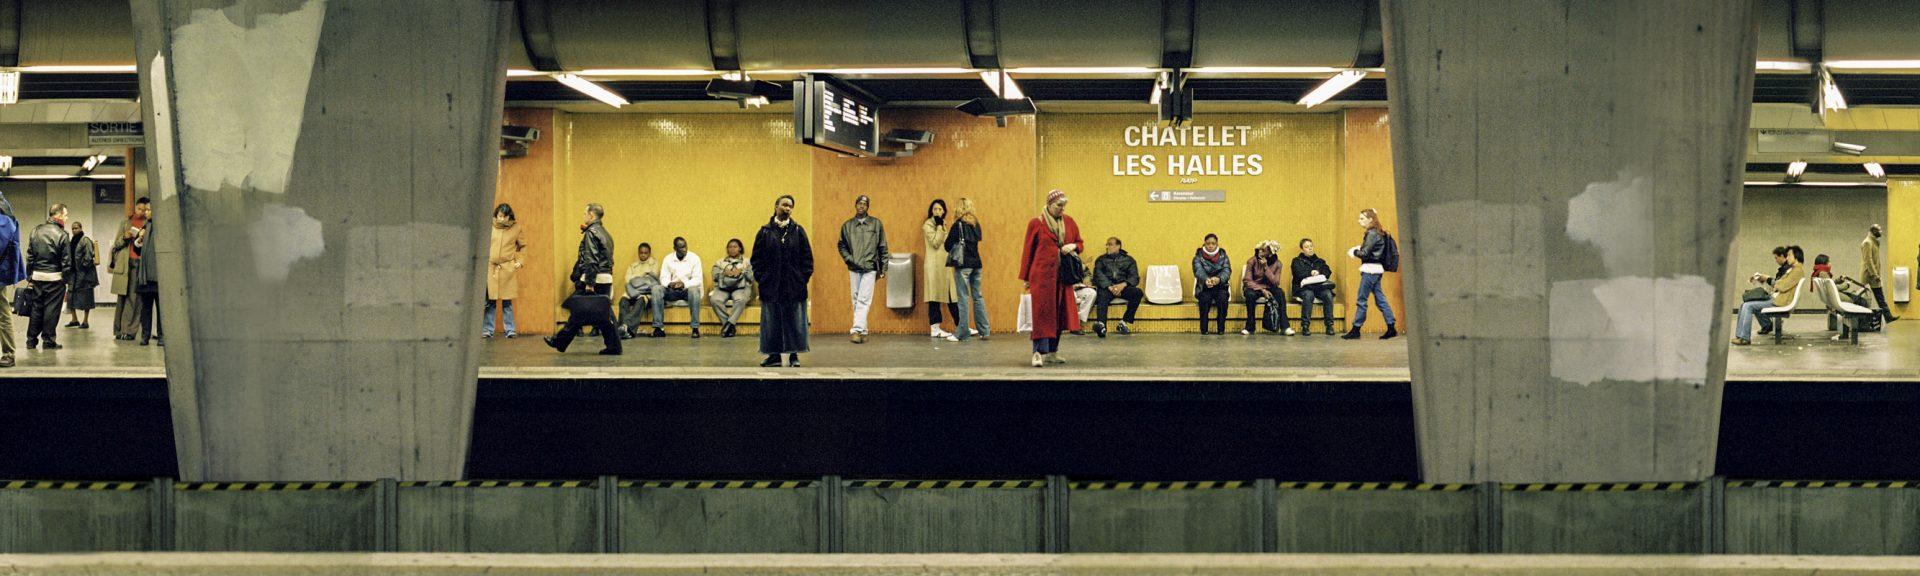 RER Chatelet-les-Halles